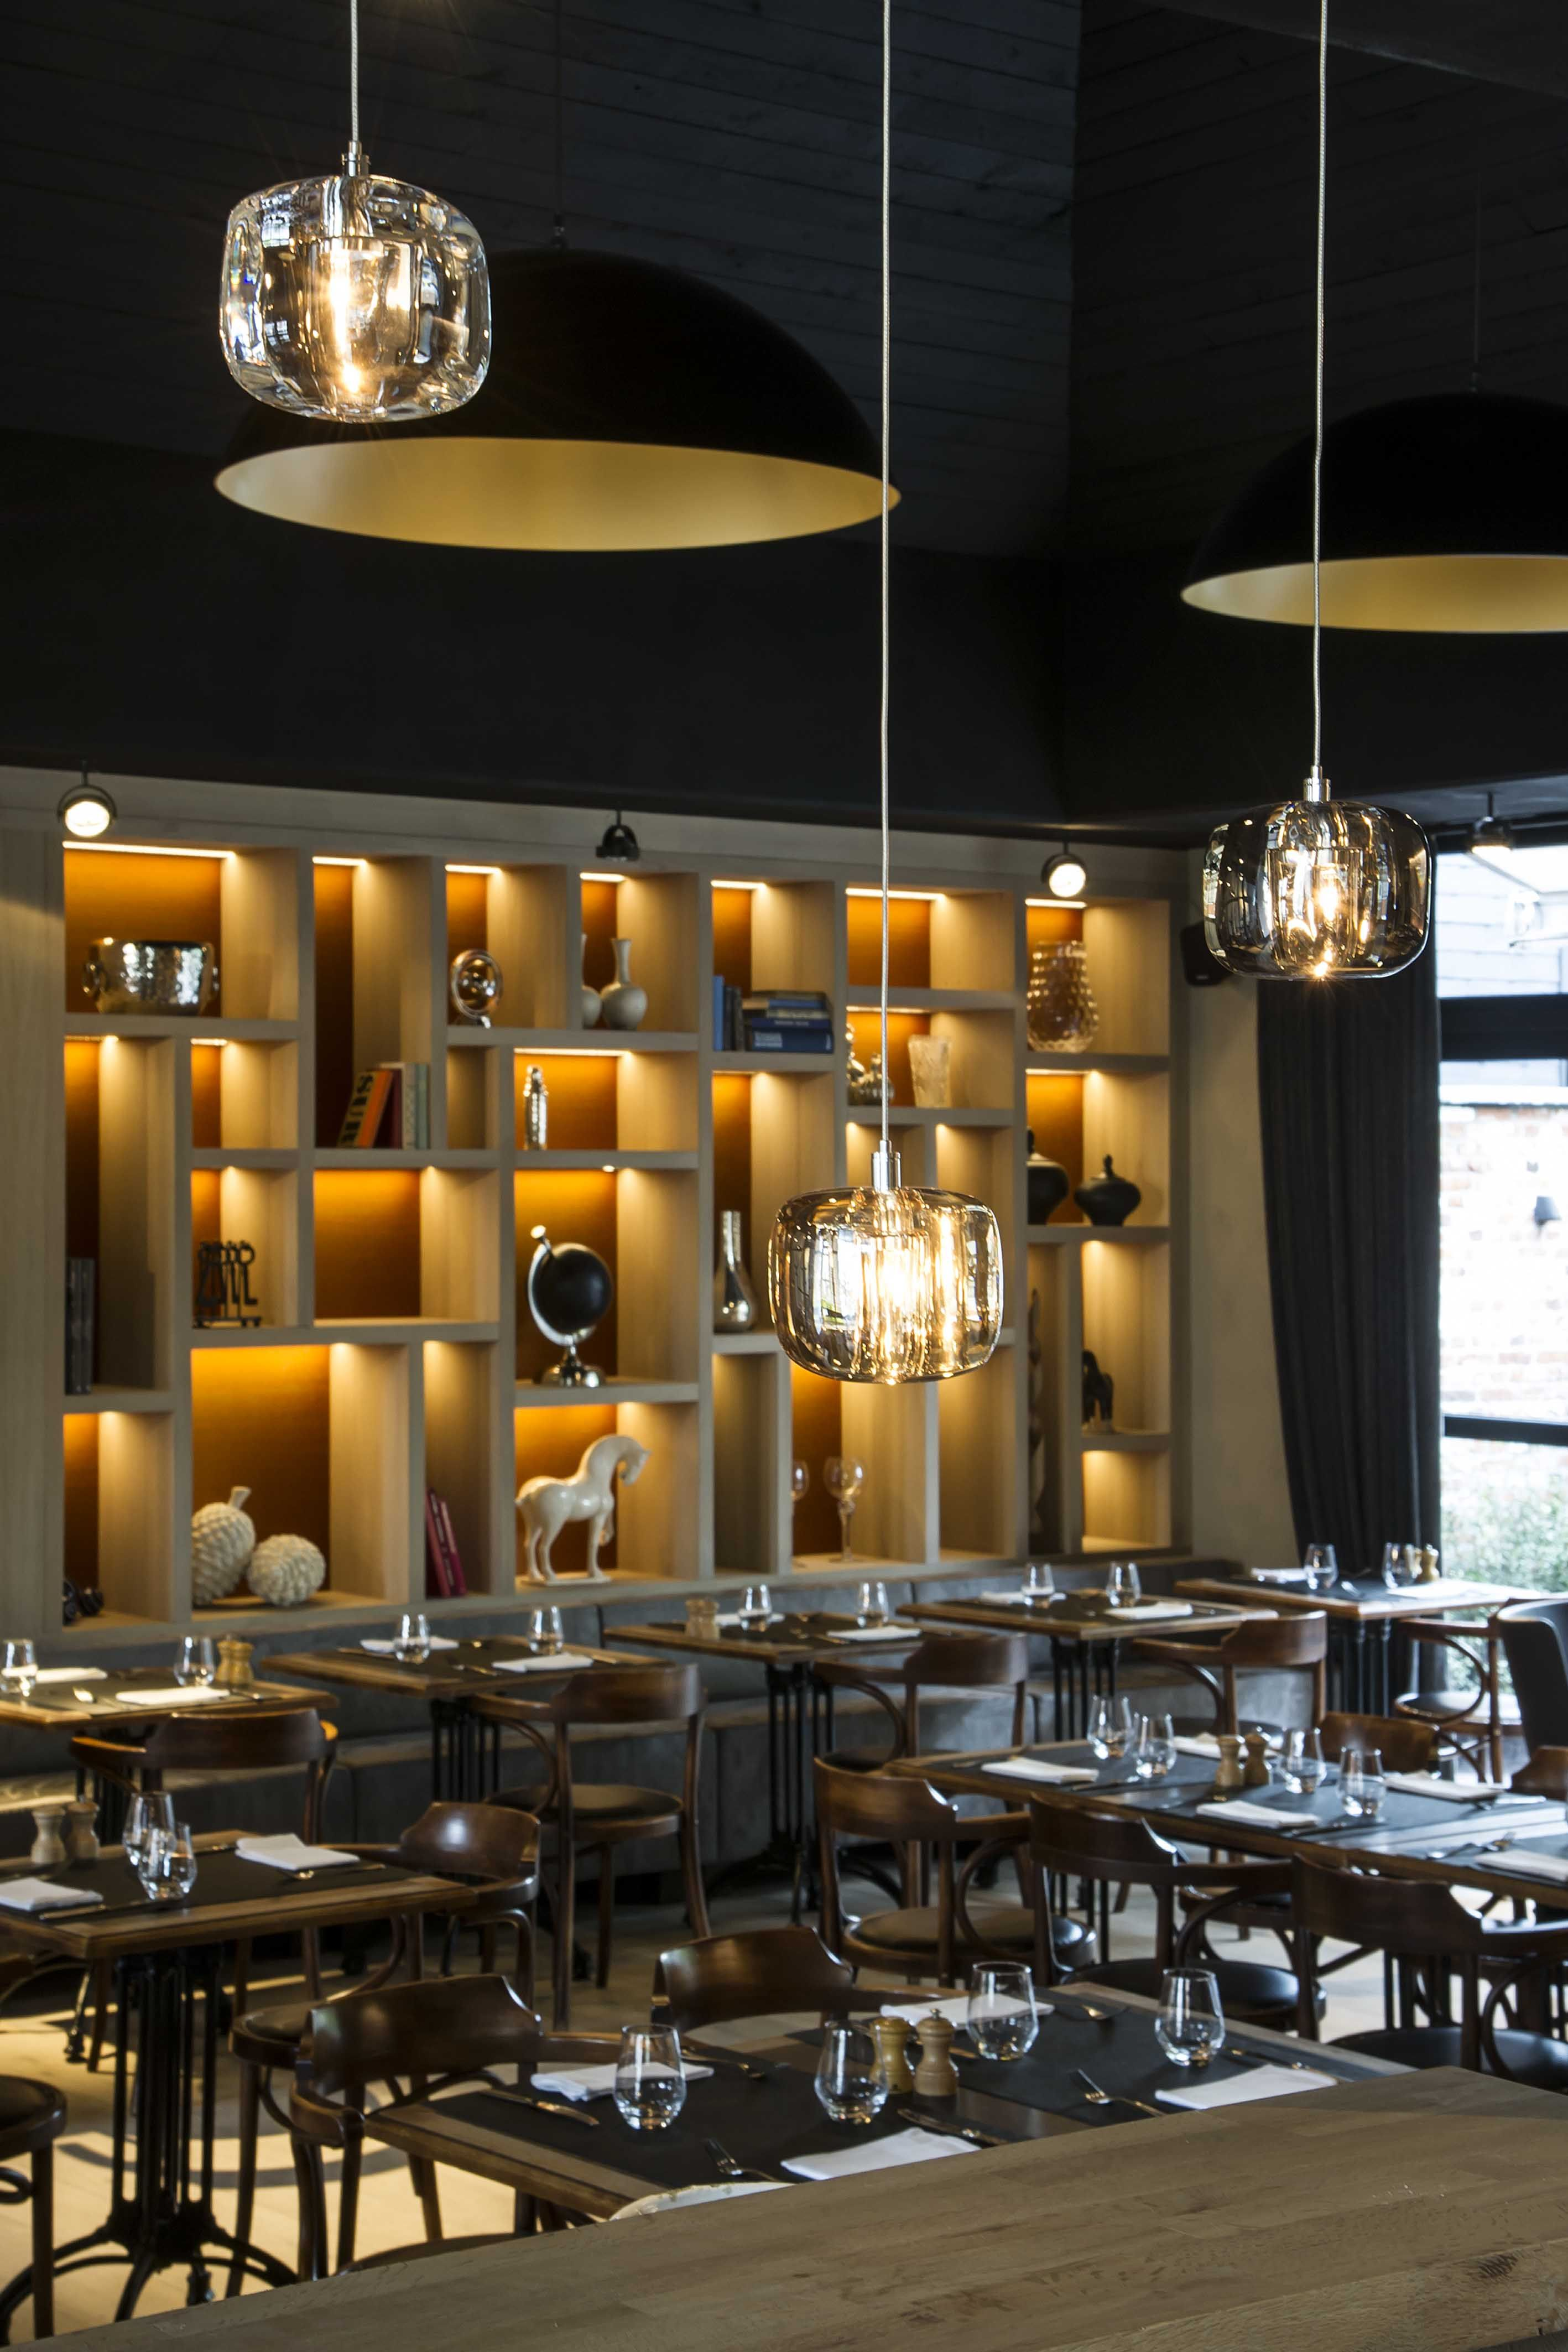 39 t klooster de pinte wille h interior design restaurant for Interior decorative lighting products